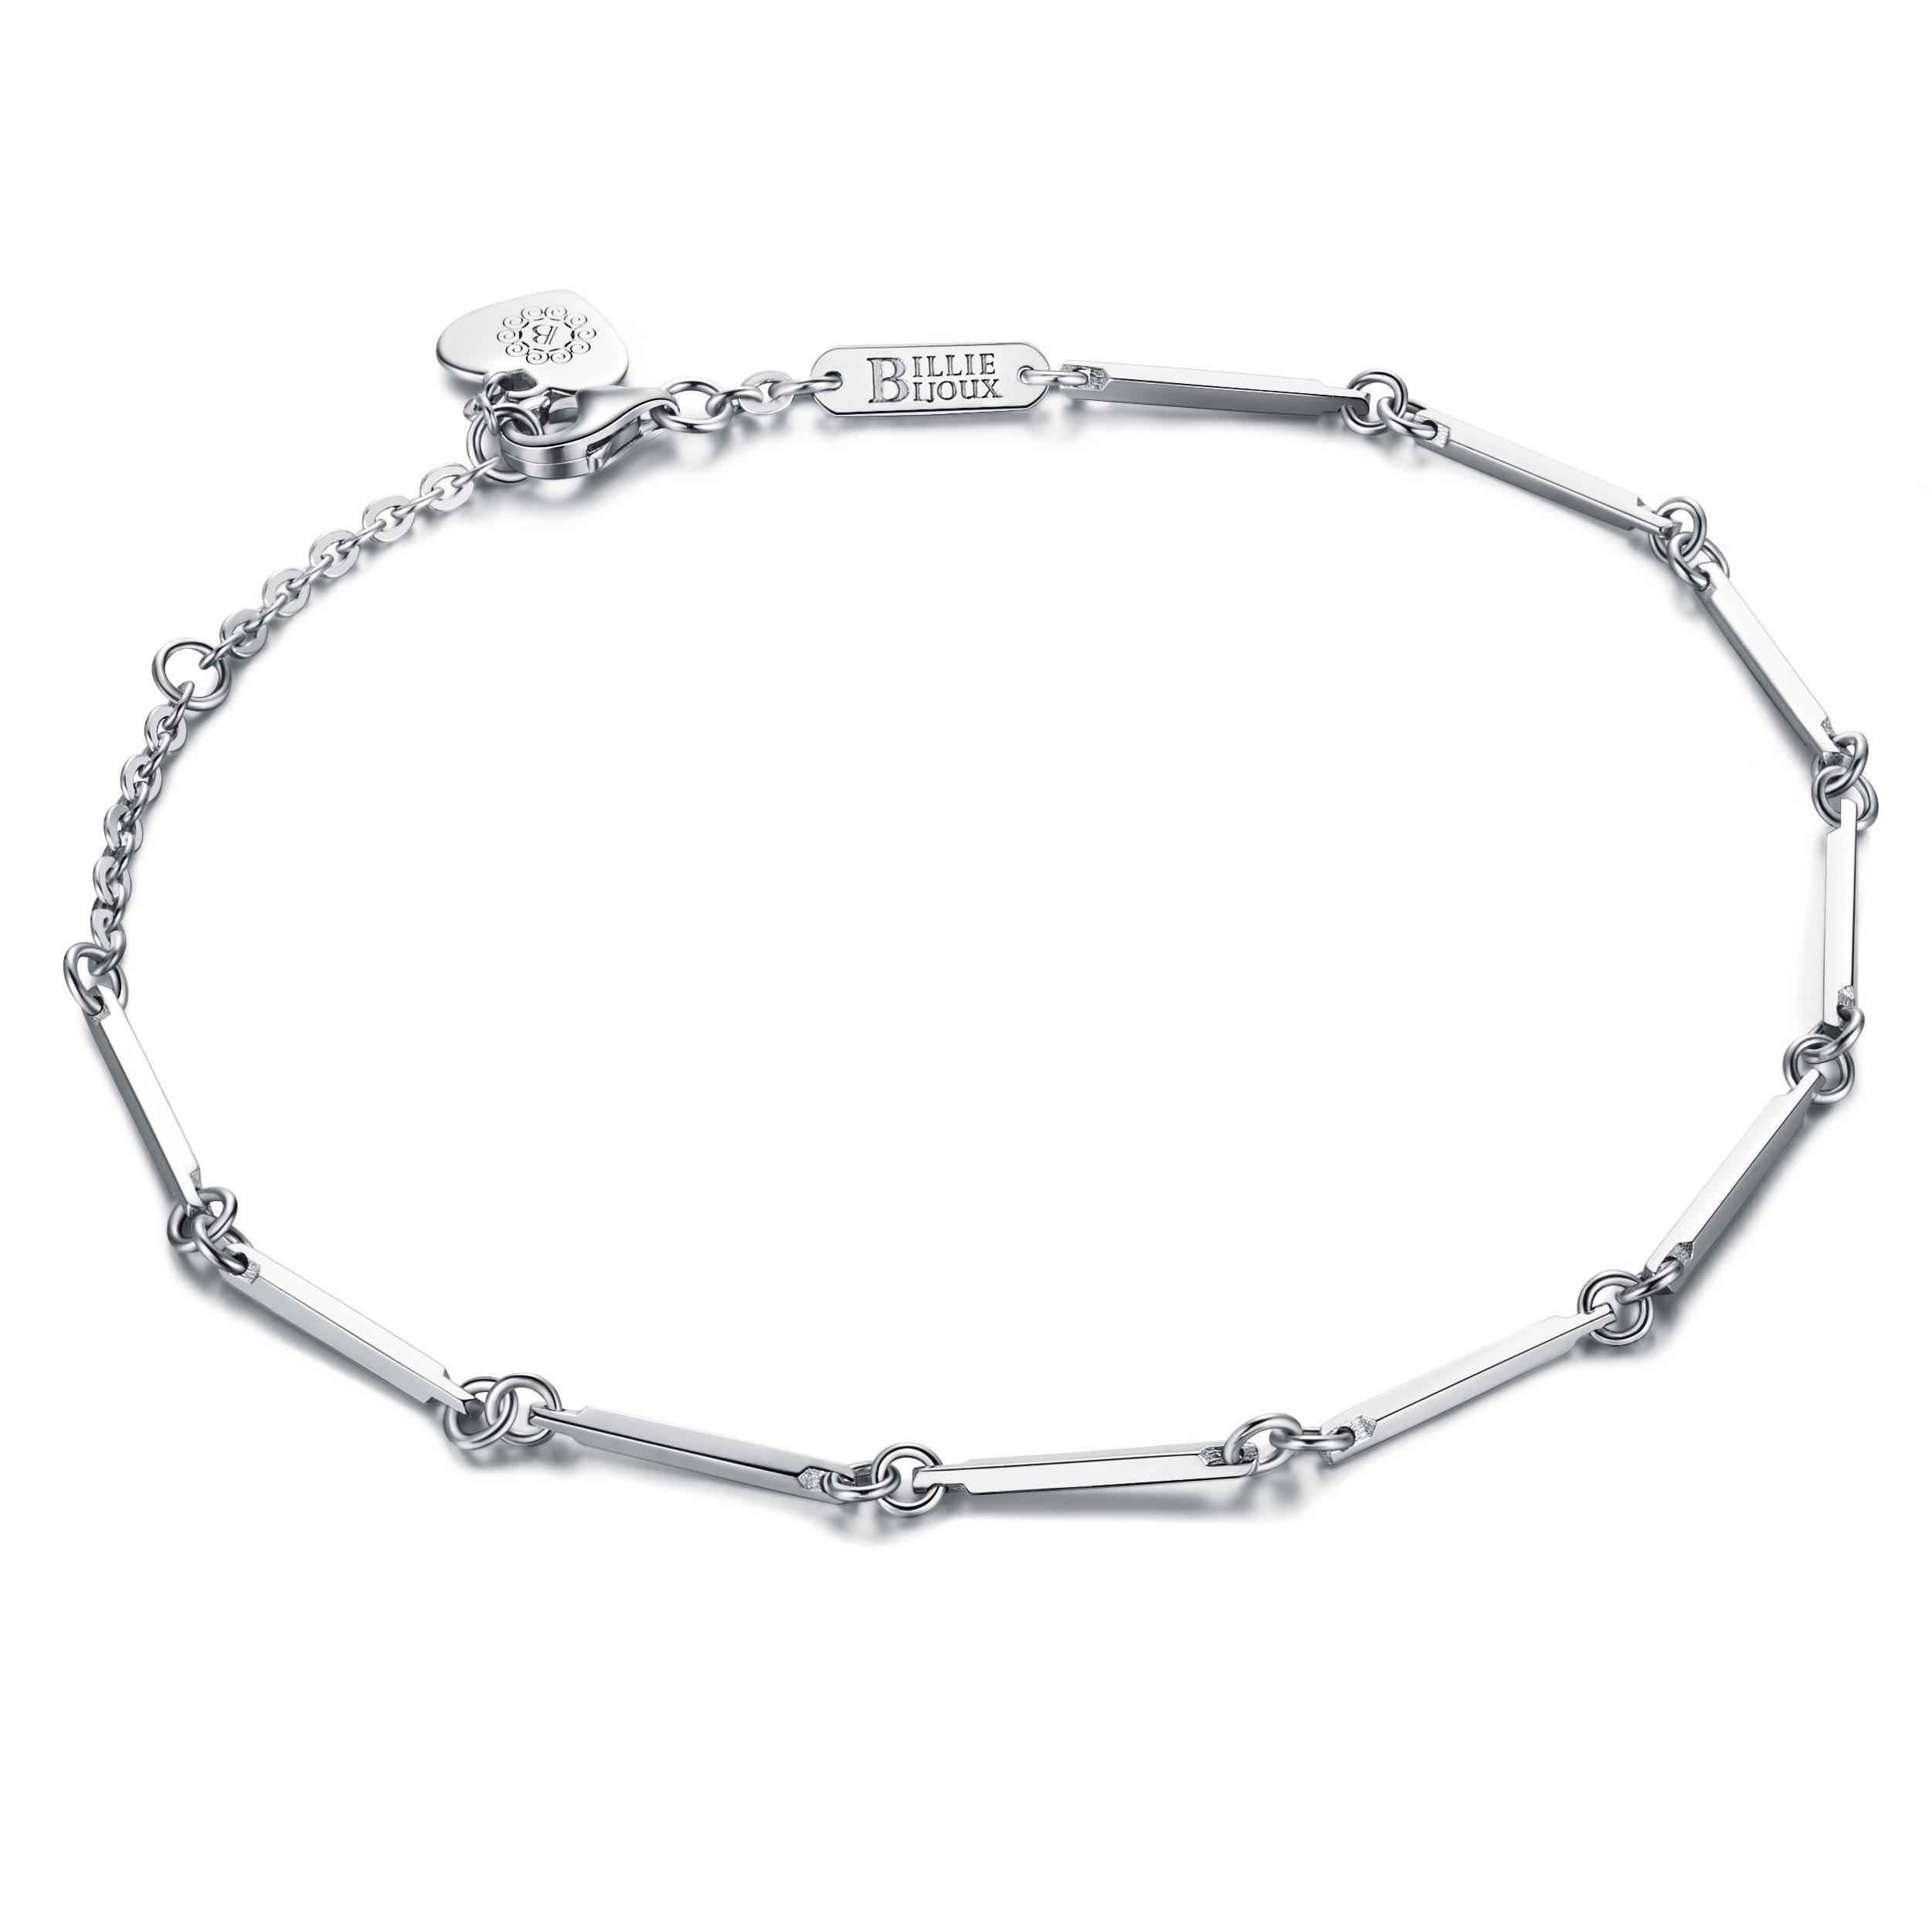 Billie Bijoux Womens 925 Sterling Silver Simple Elegant Chain Bracelet Small Anklet for Women Girls White Gold Plated